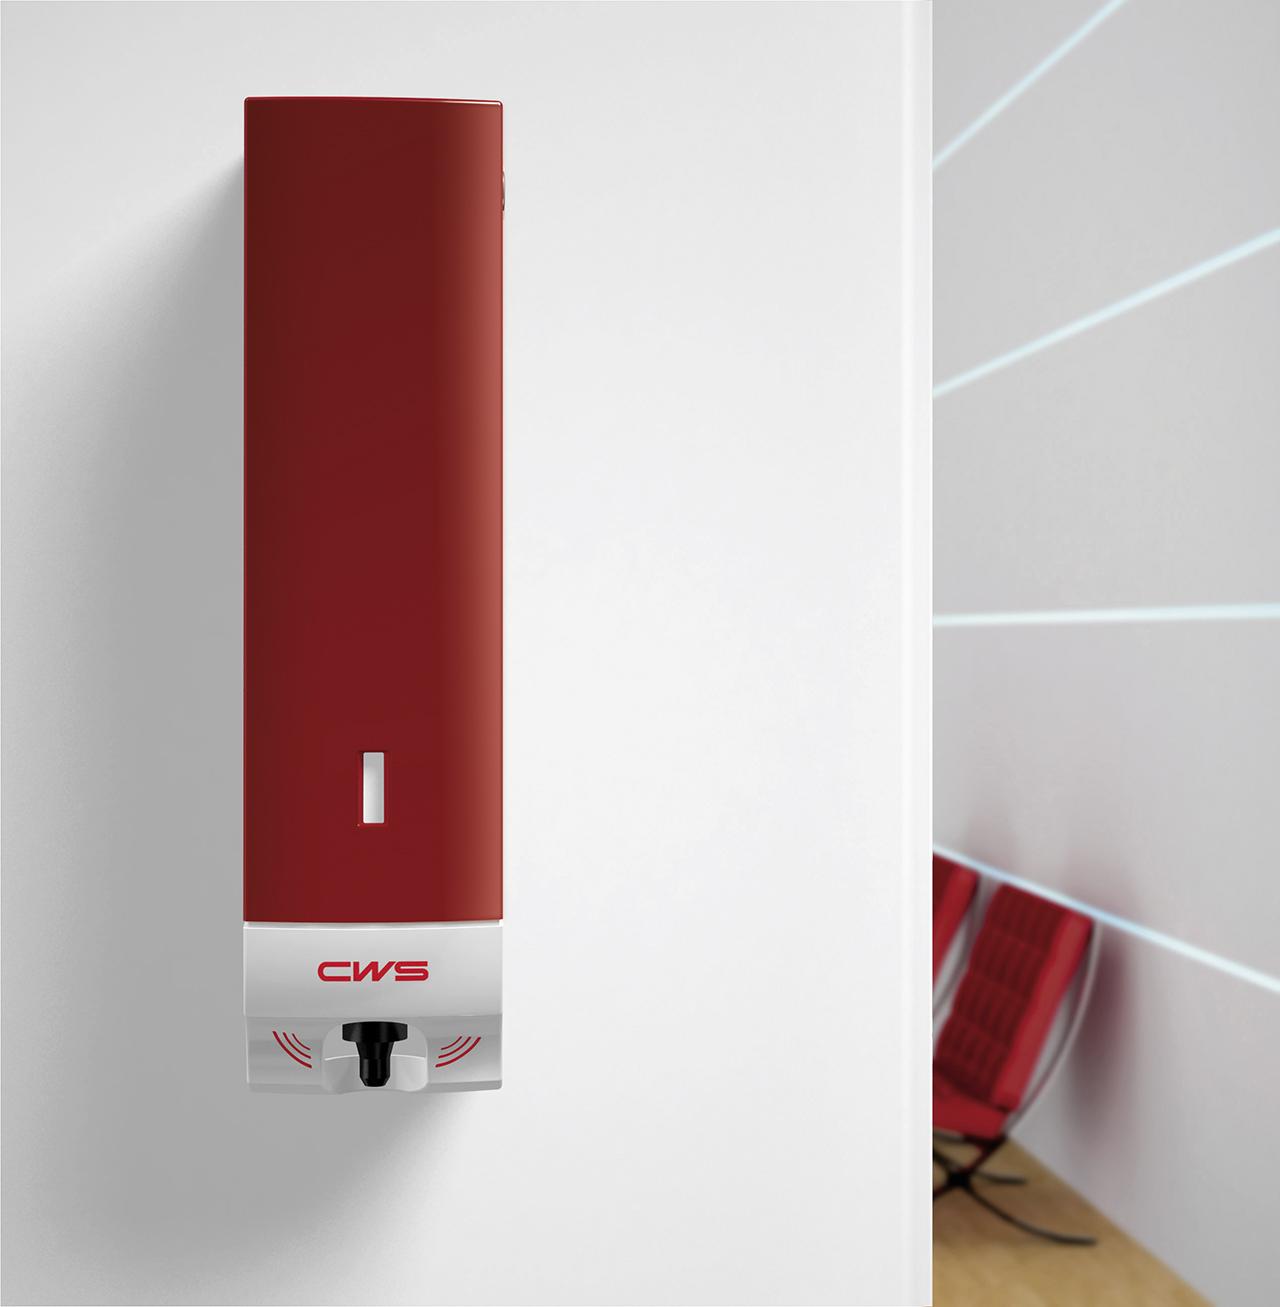 Hygiene CWS Soap Dispenser